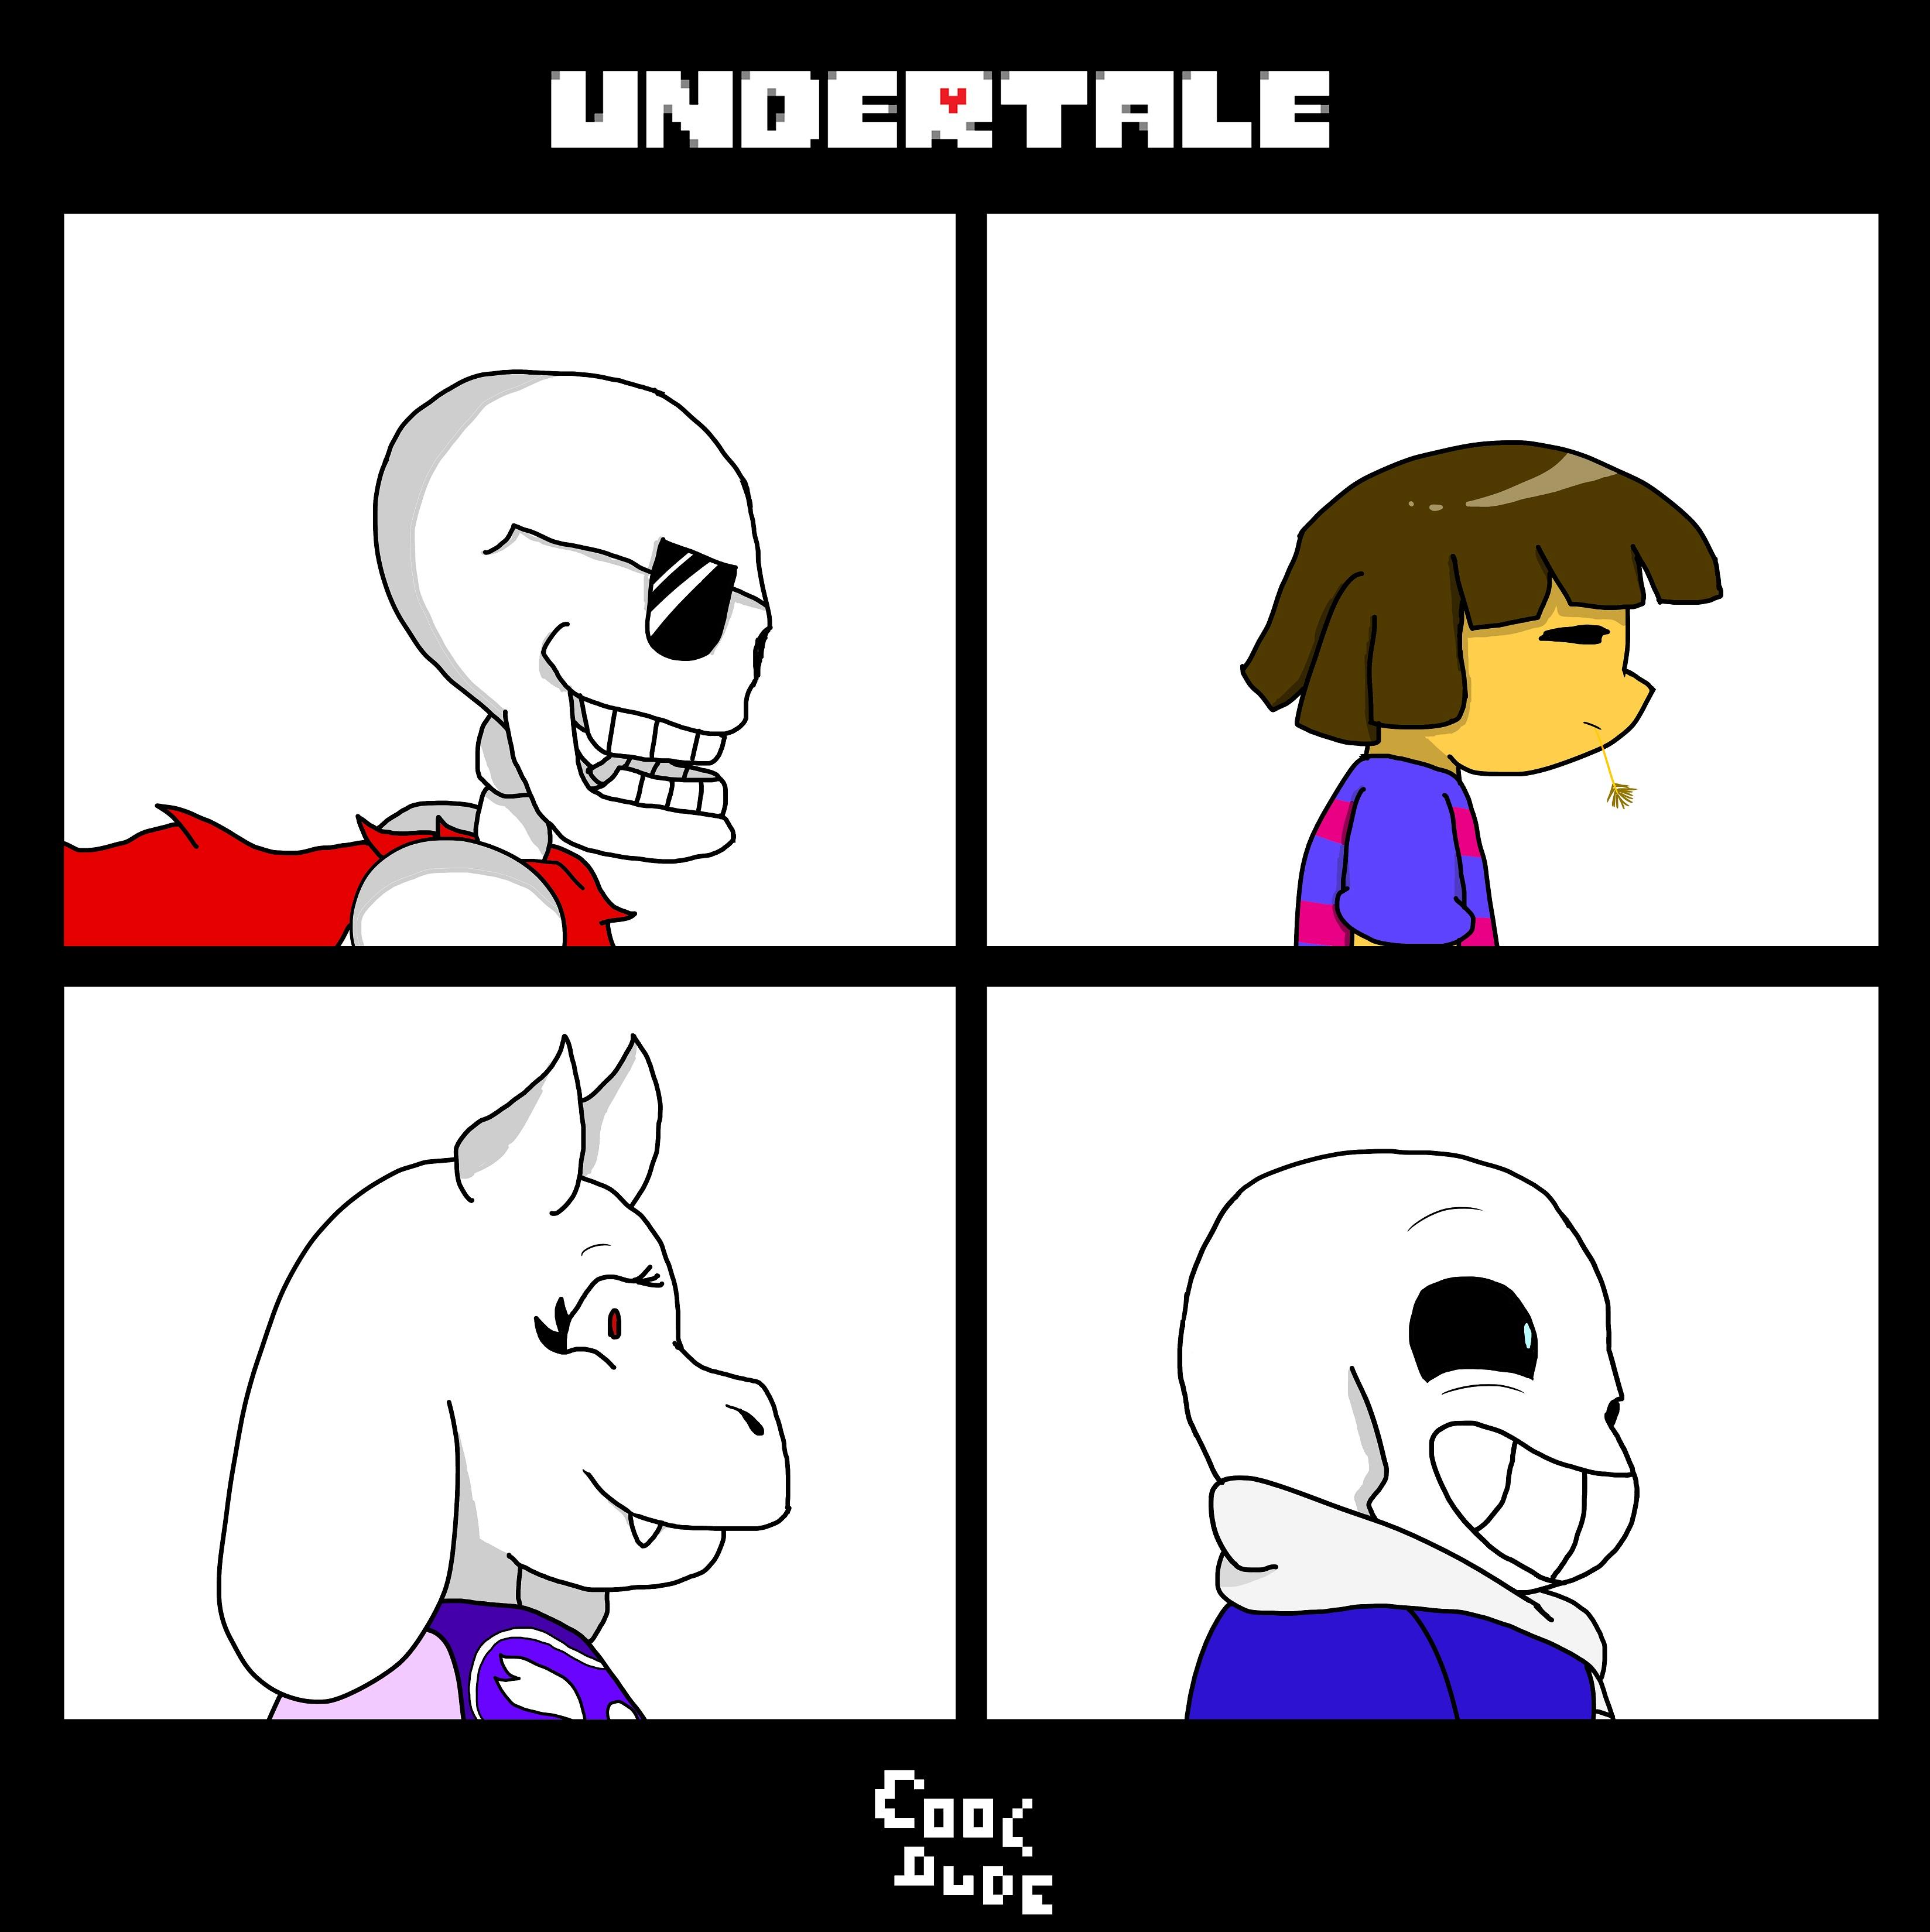 Undertale/Gorillaz crossover